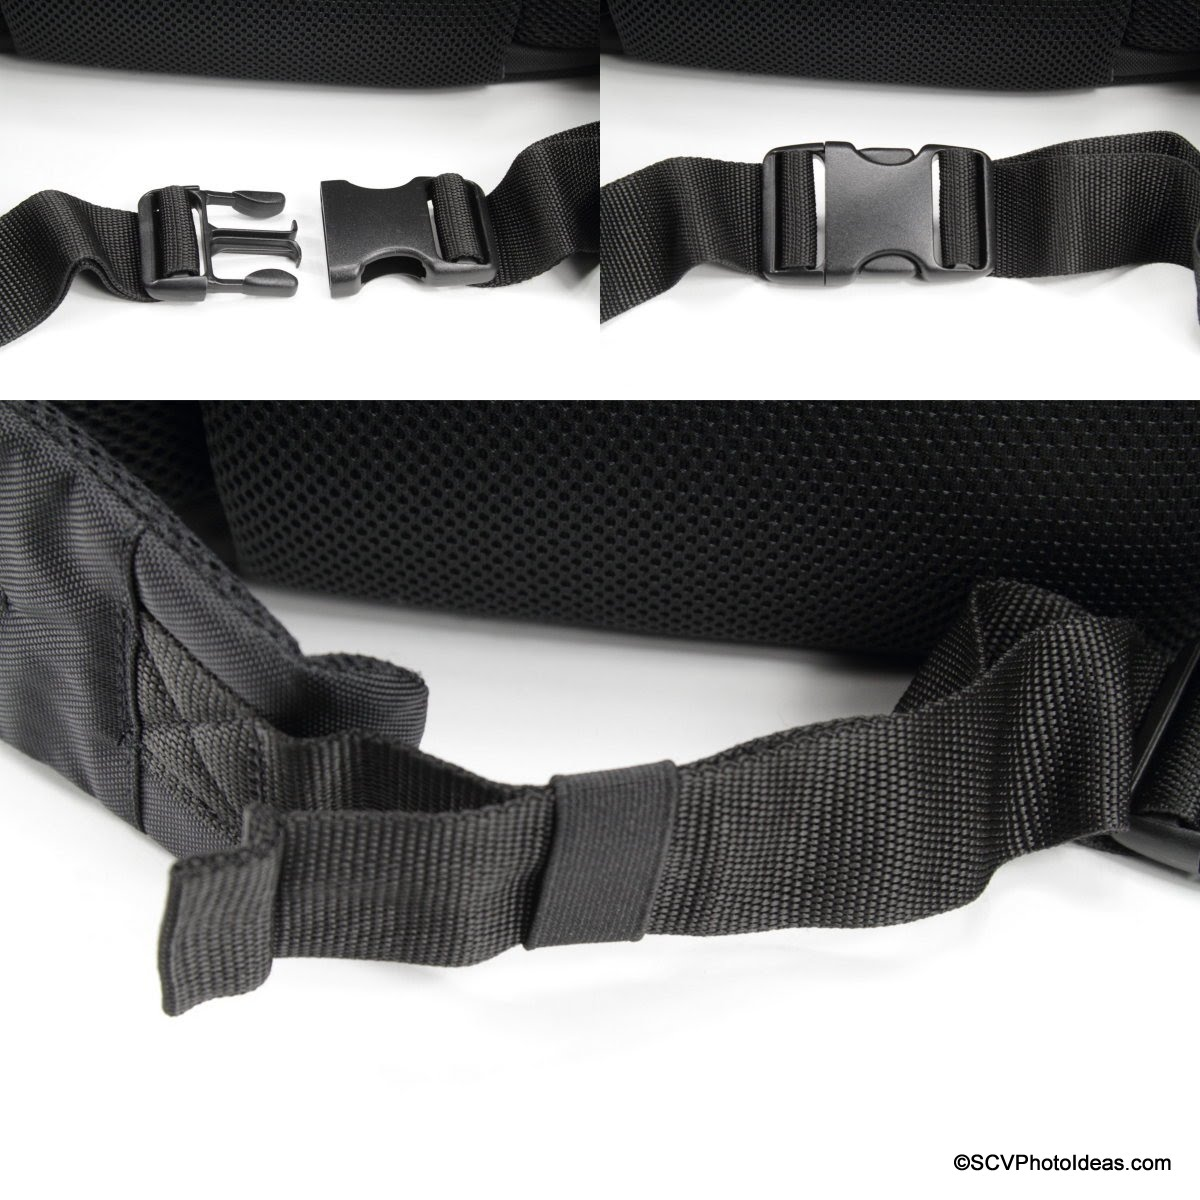 Case Logic DSB-103 waist belt buckle and strap details